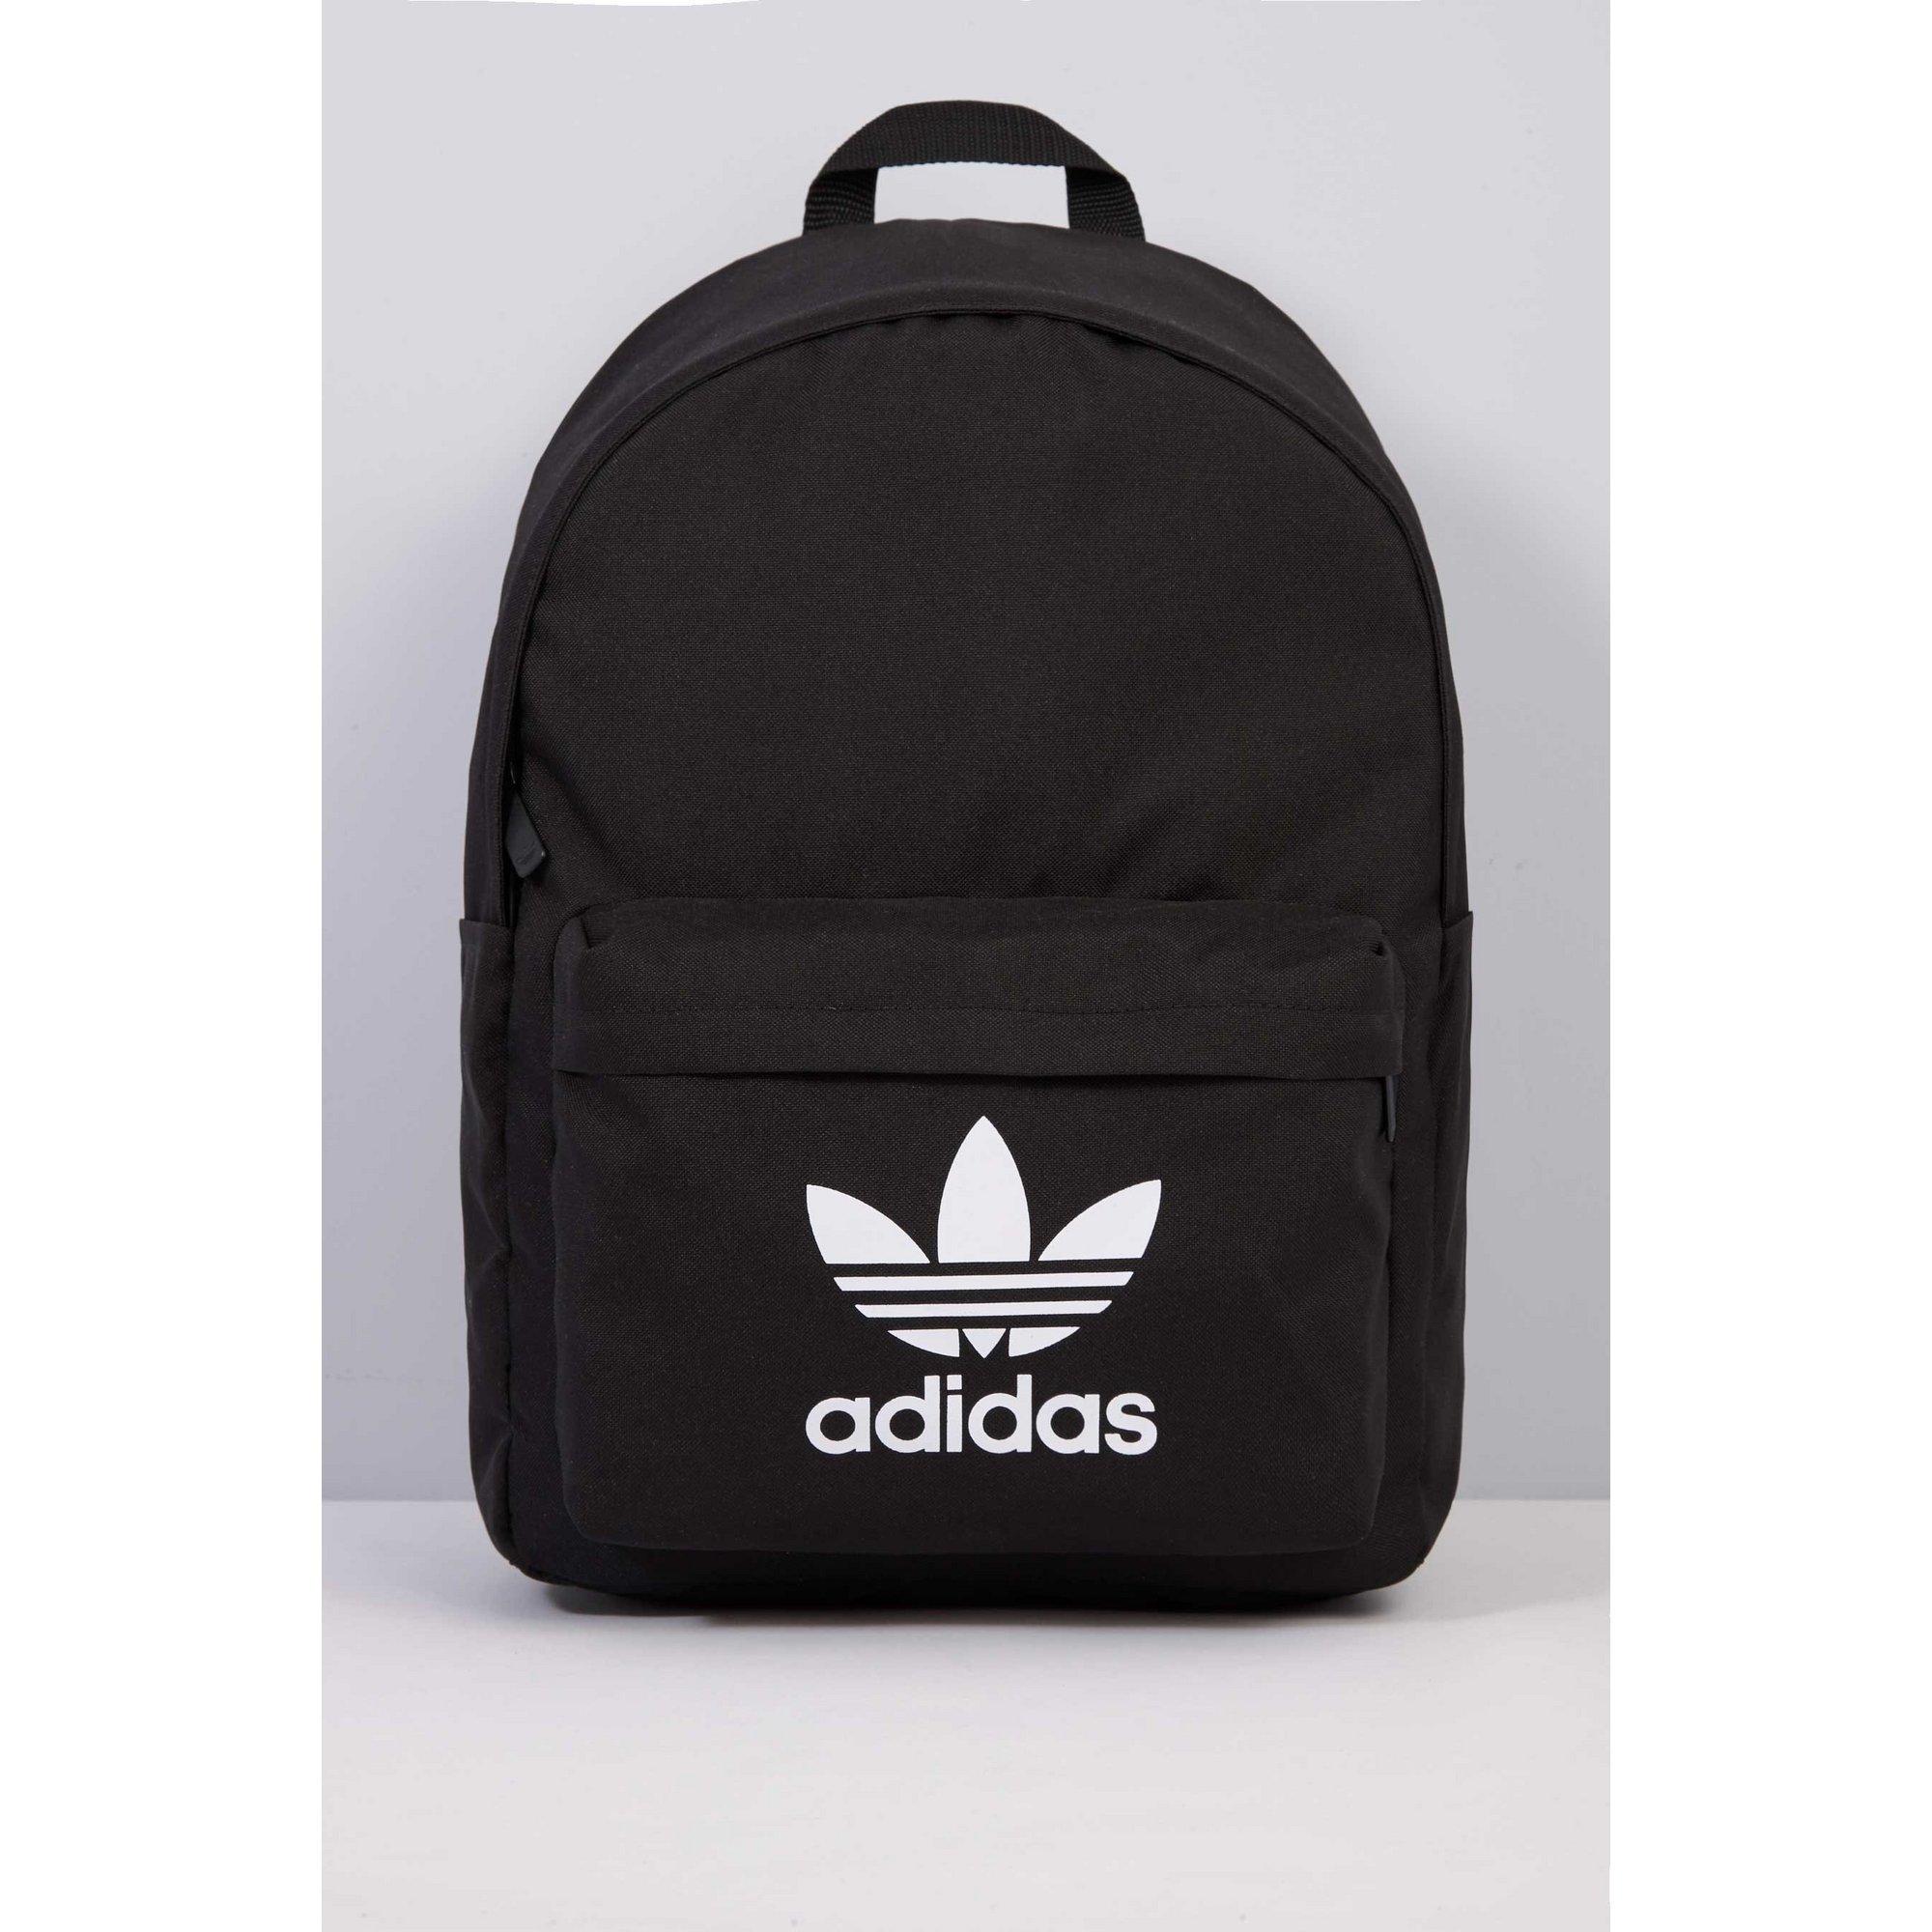 Image of adidas Originals Trefoil Classic Black Backpack